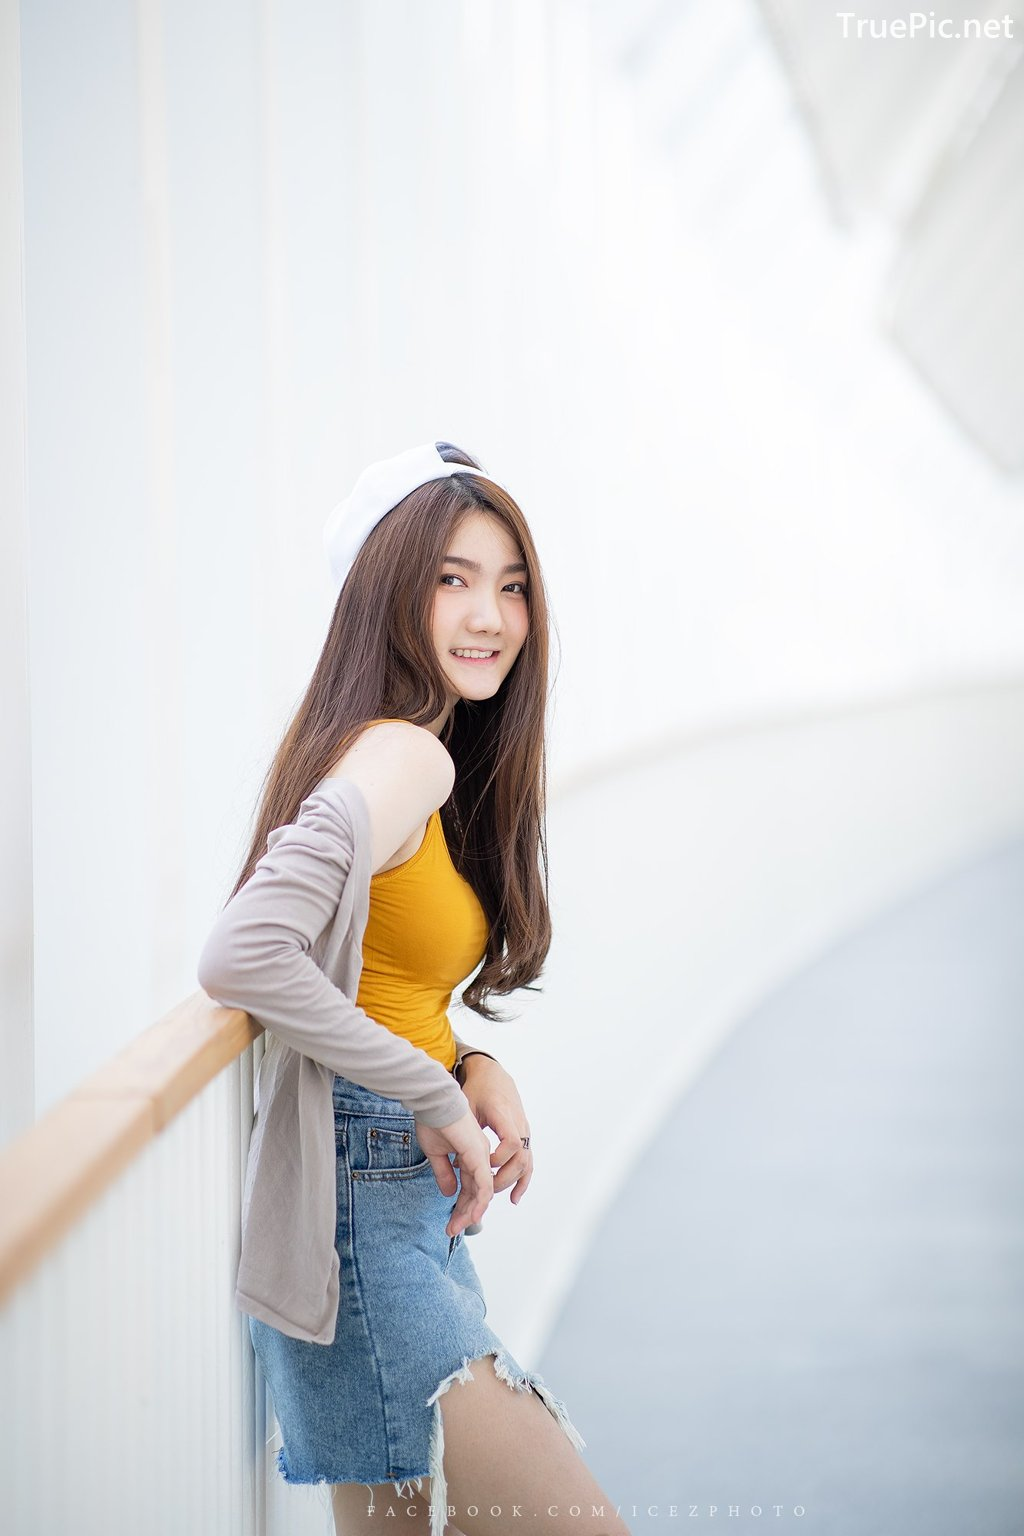 Image-Thailand-Cute-Model-Creammy-Chanama-Beautiful-Angel-In-Flower-Garden-TruePic.net- Picture-3